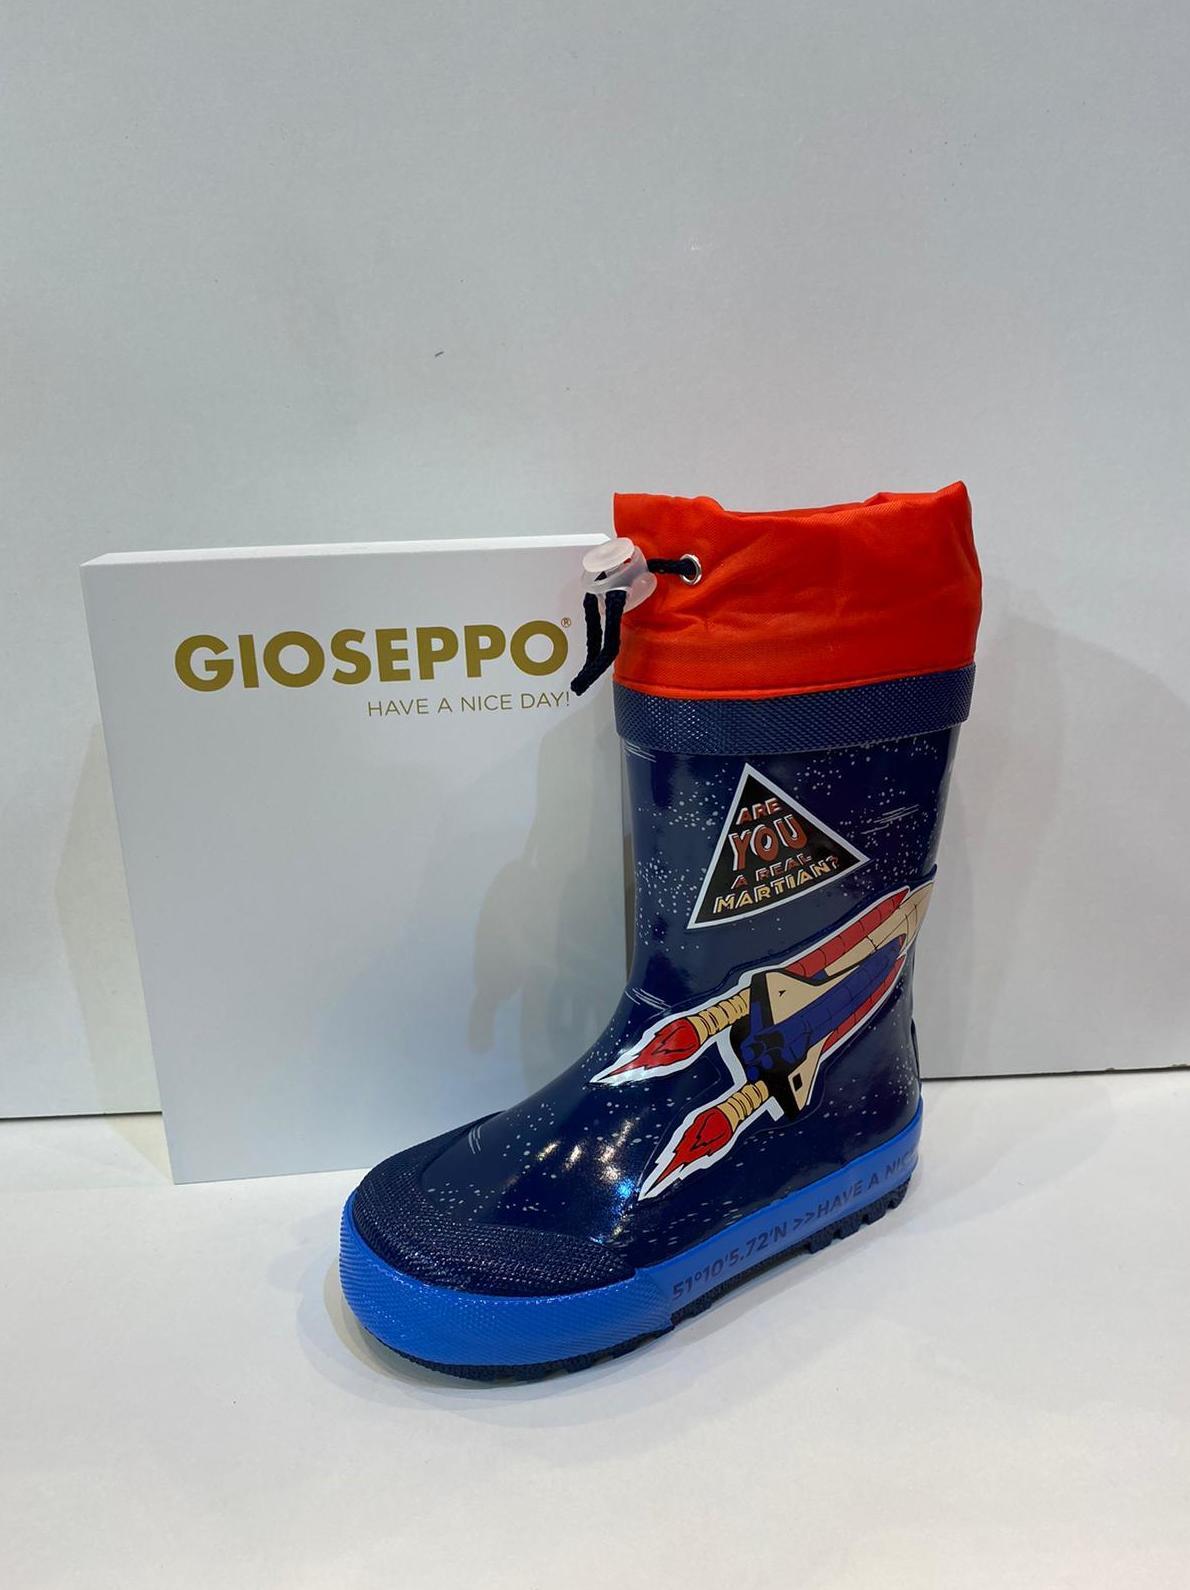 Bota d'aigua de nen, de la marca Gioseppo, de caucho 100% 26,95€